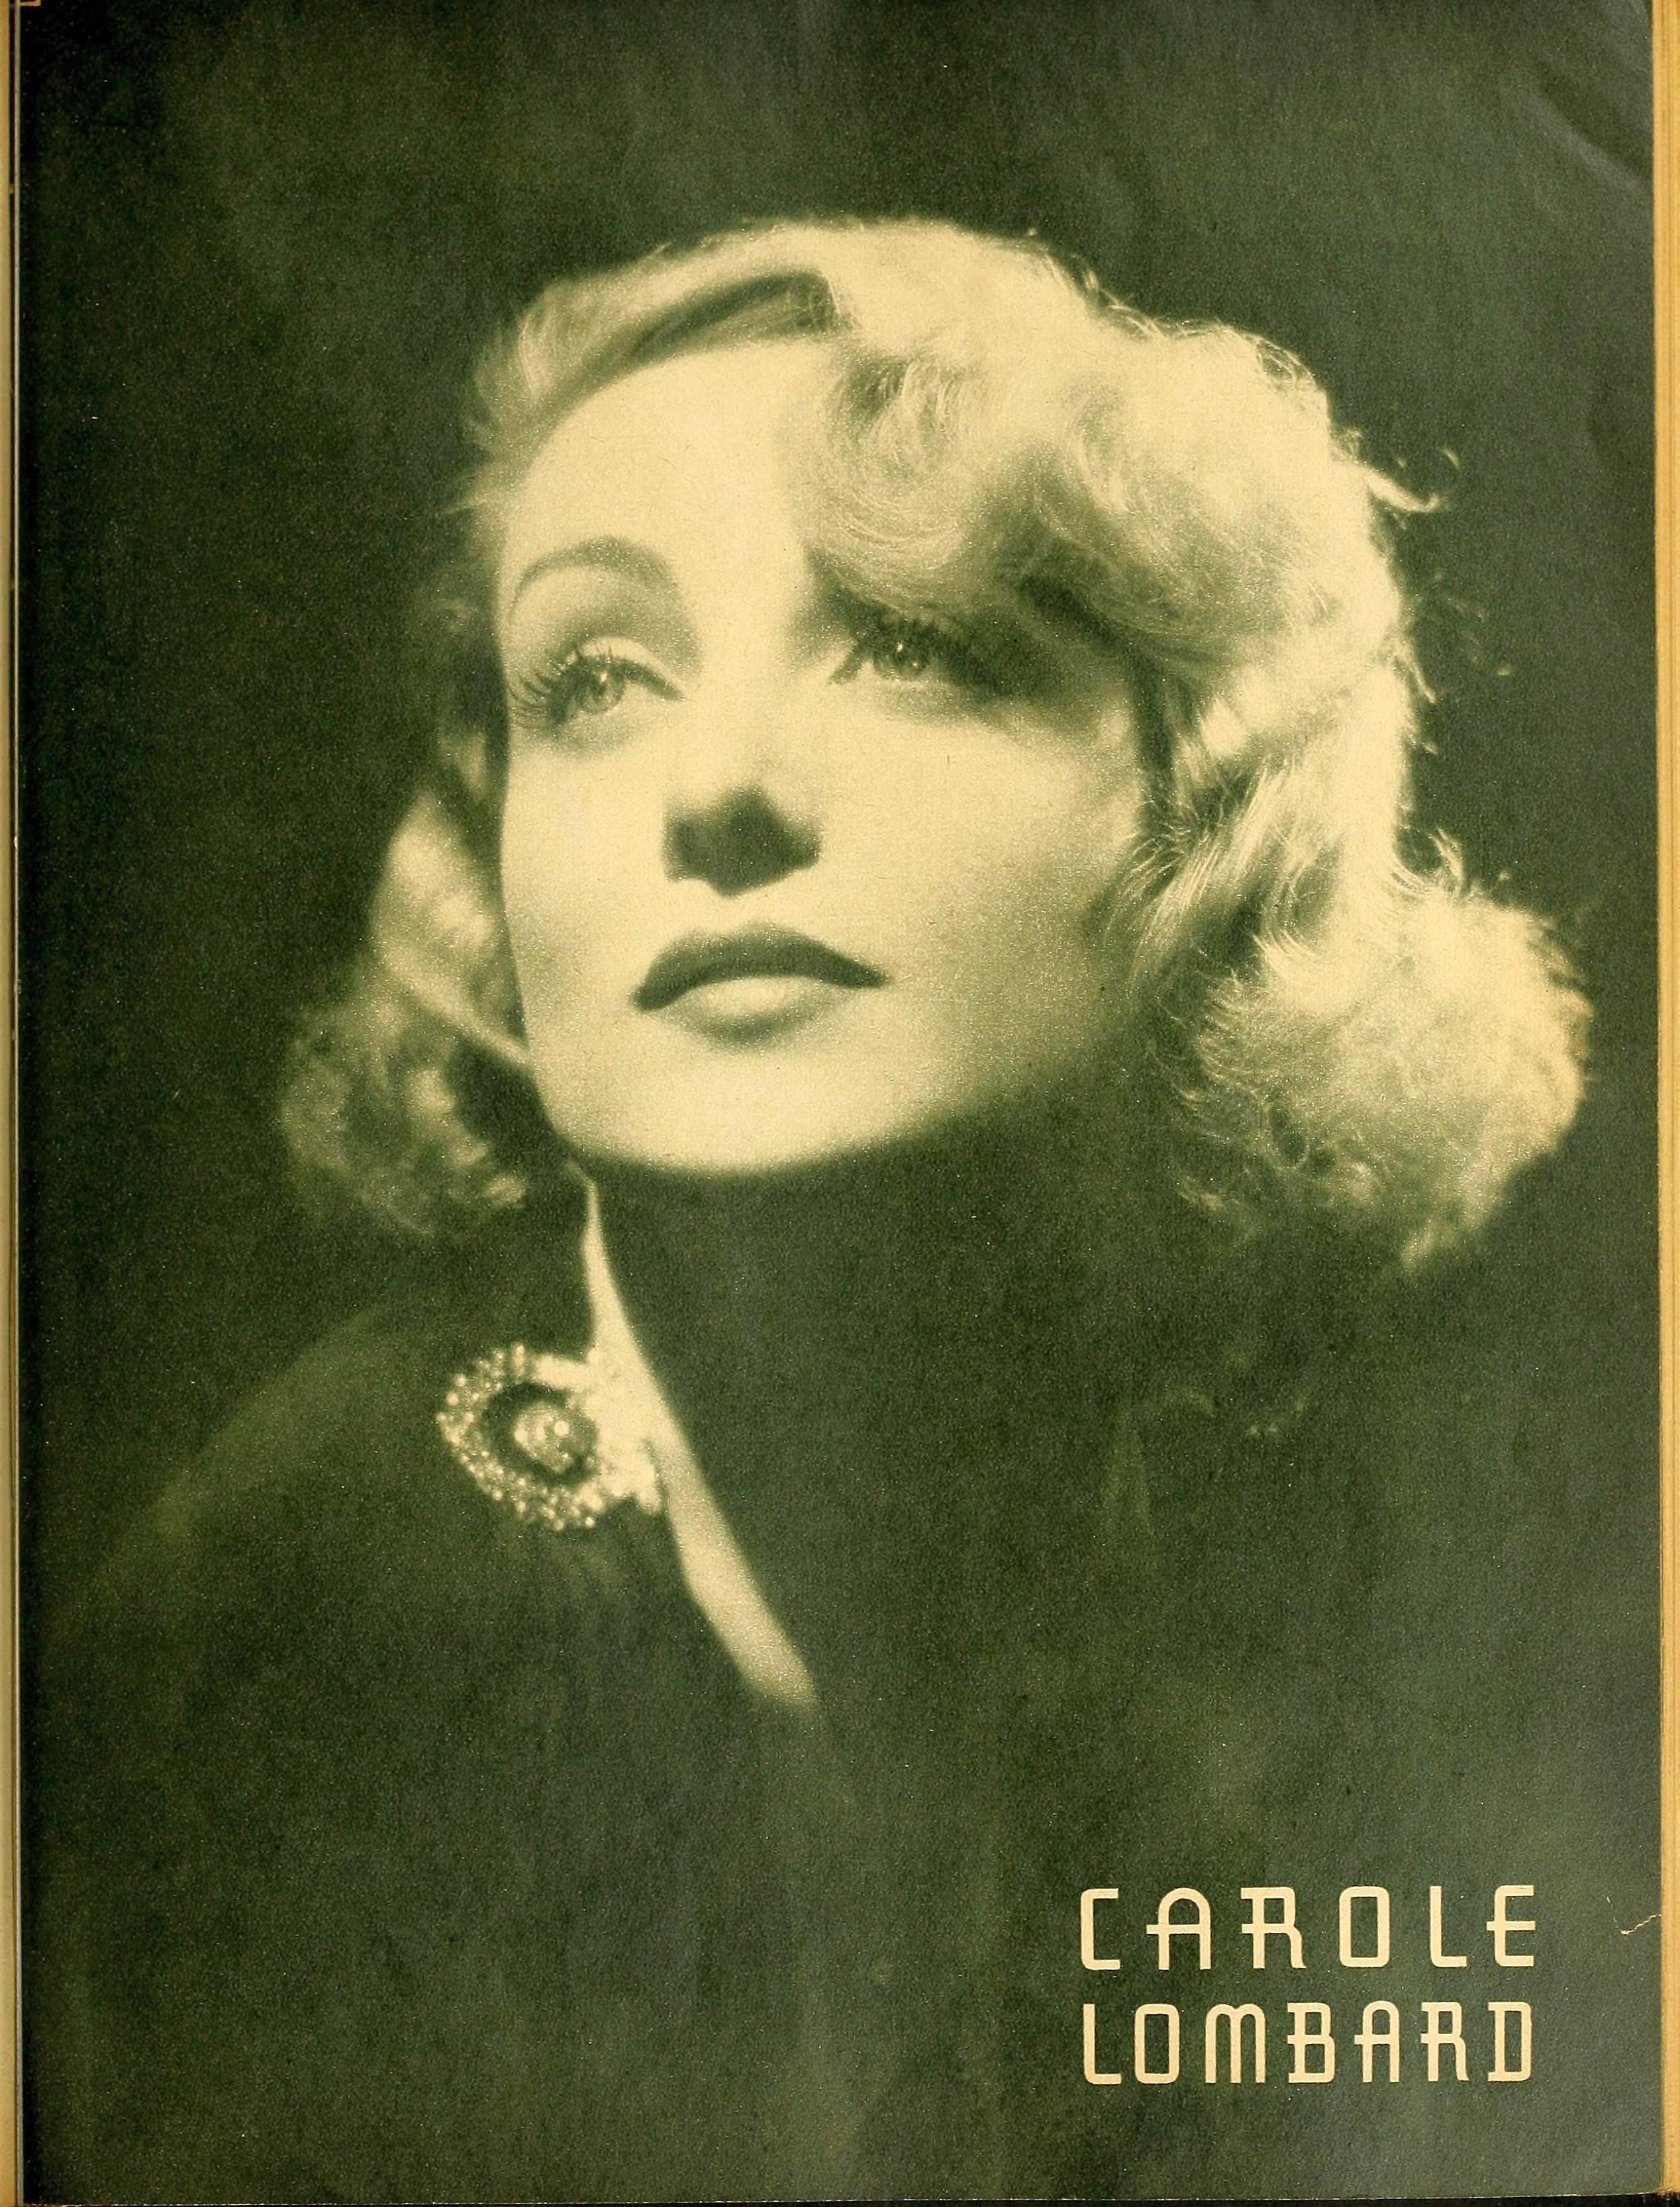 carole lombard hollywood august 1937a